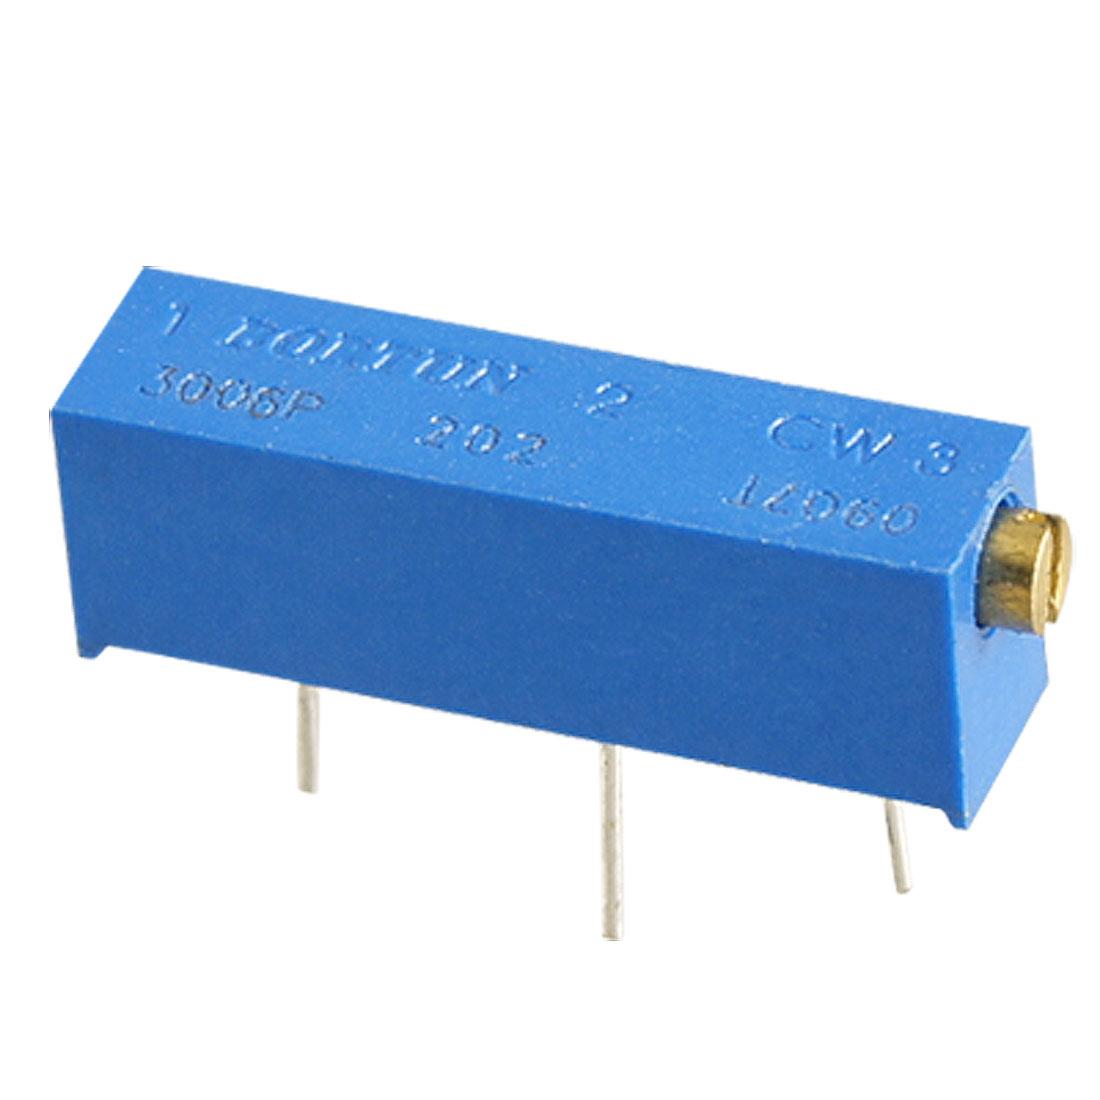 25pcs 3006P 2K ohm Trimmer Pot Potentiometers Variable Resistor